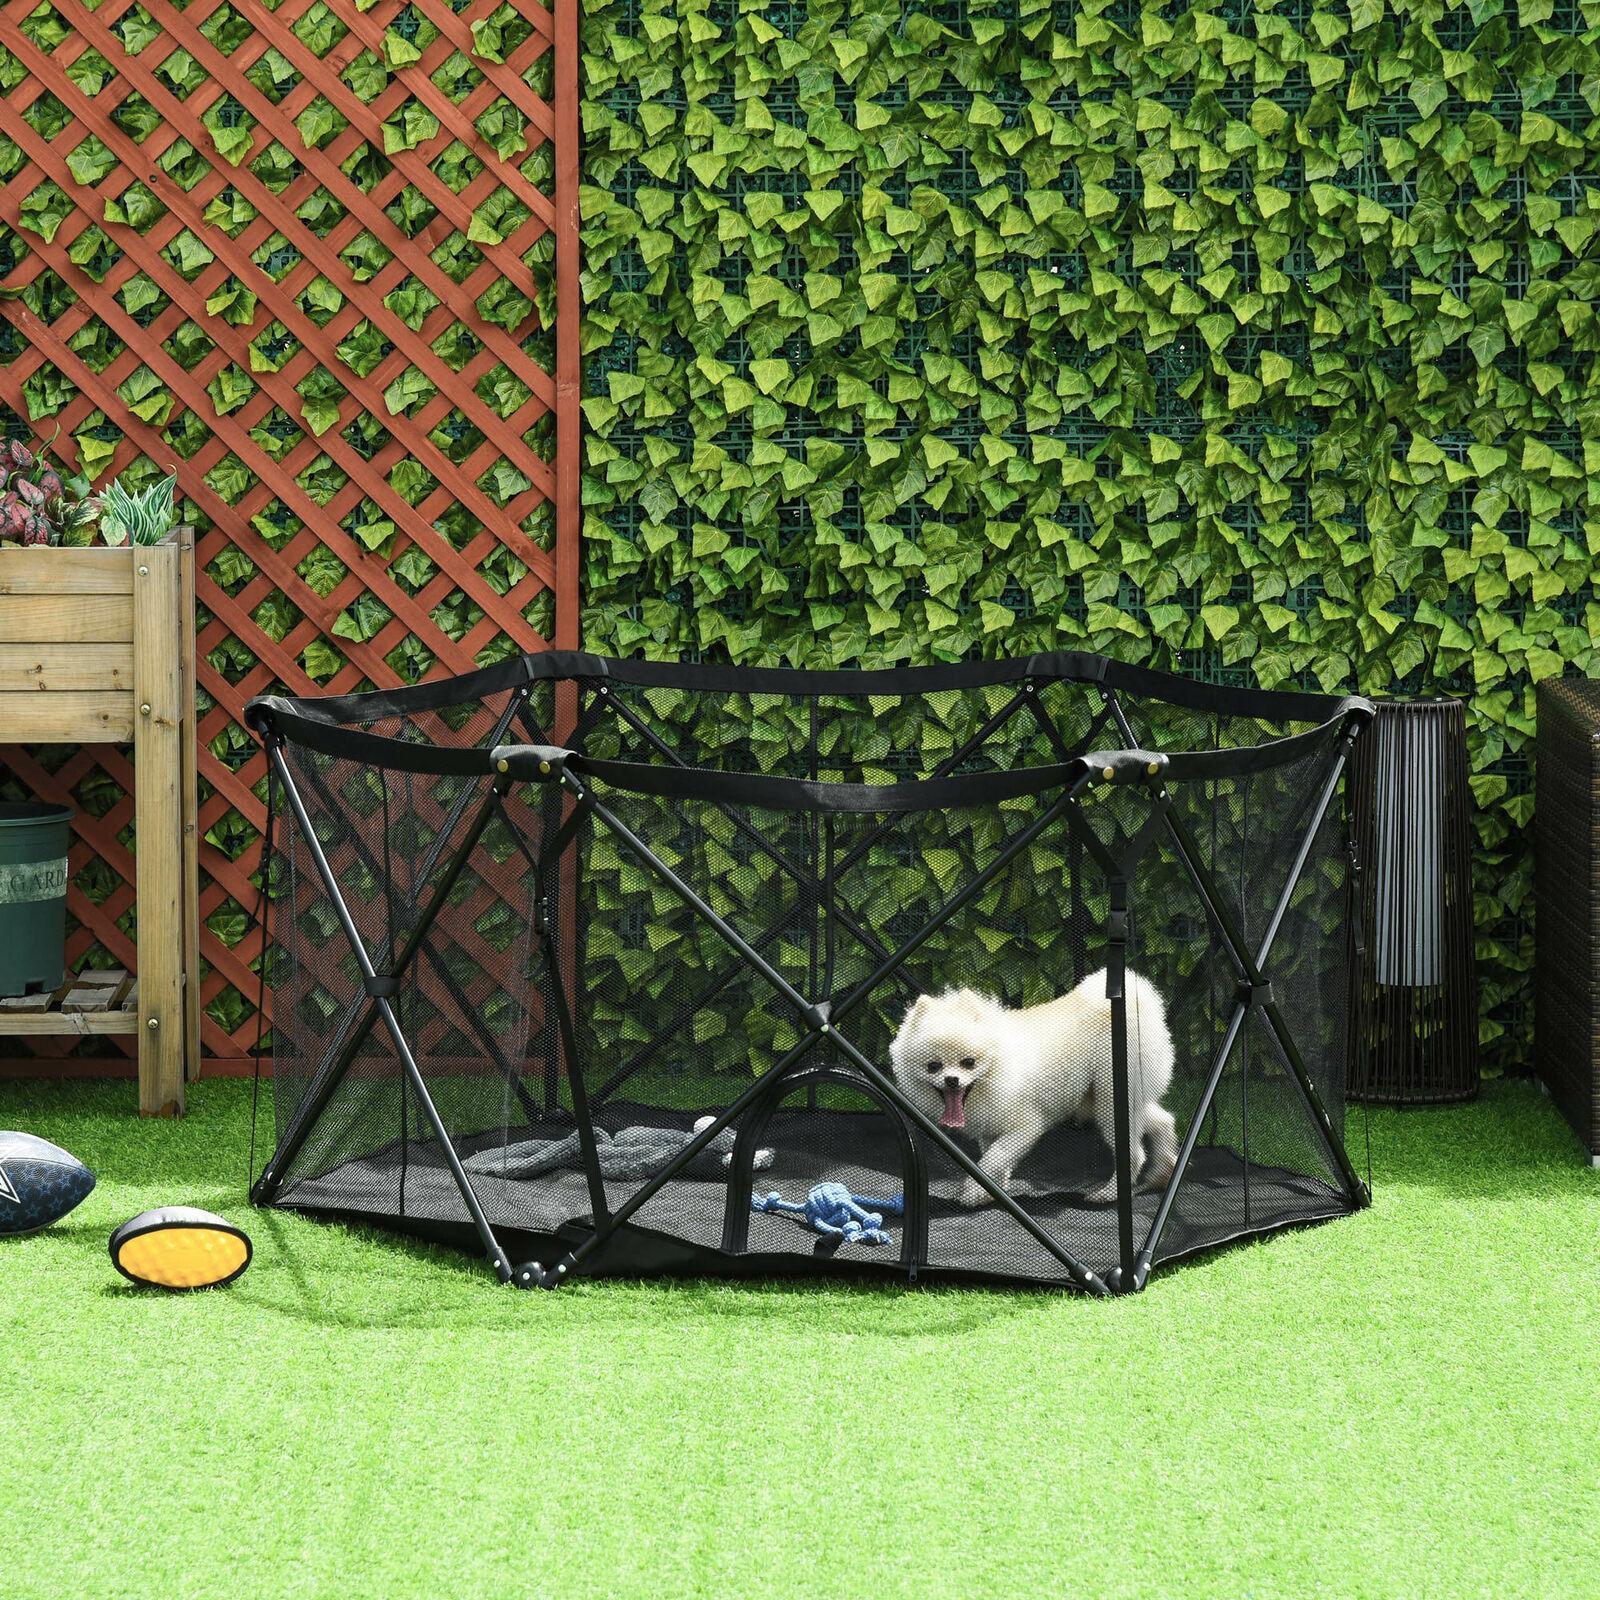 Parque para Mascotas Plegable Acero con Bolsa de Transporte 148x134x67 cm Negro